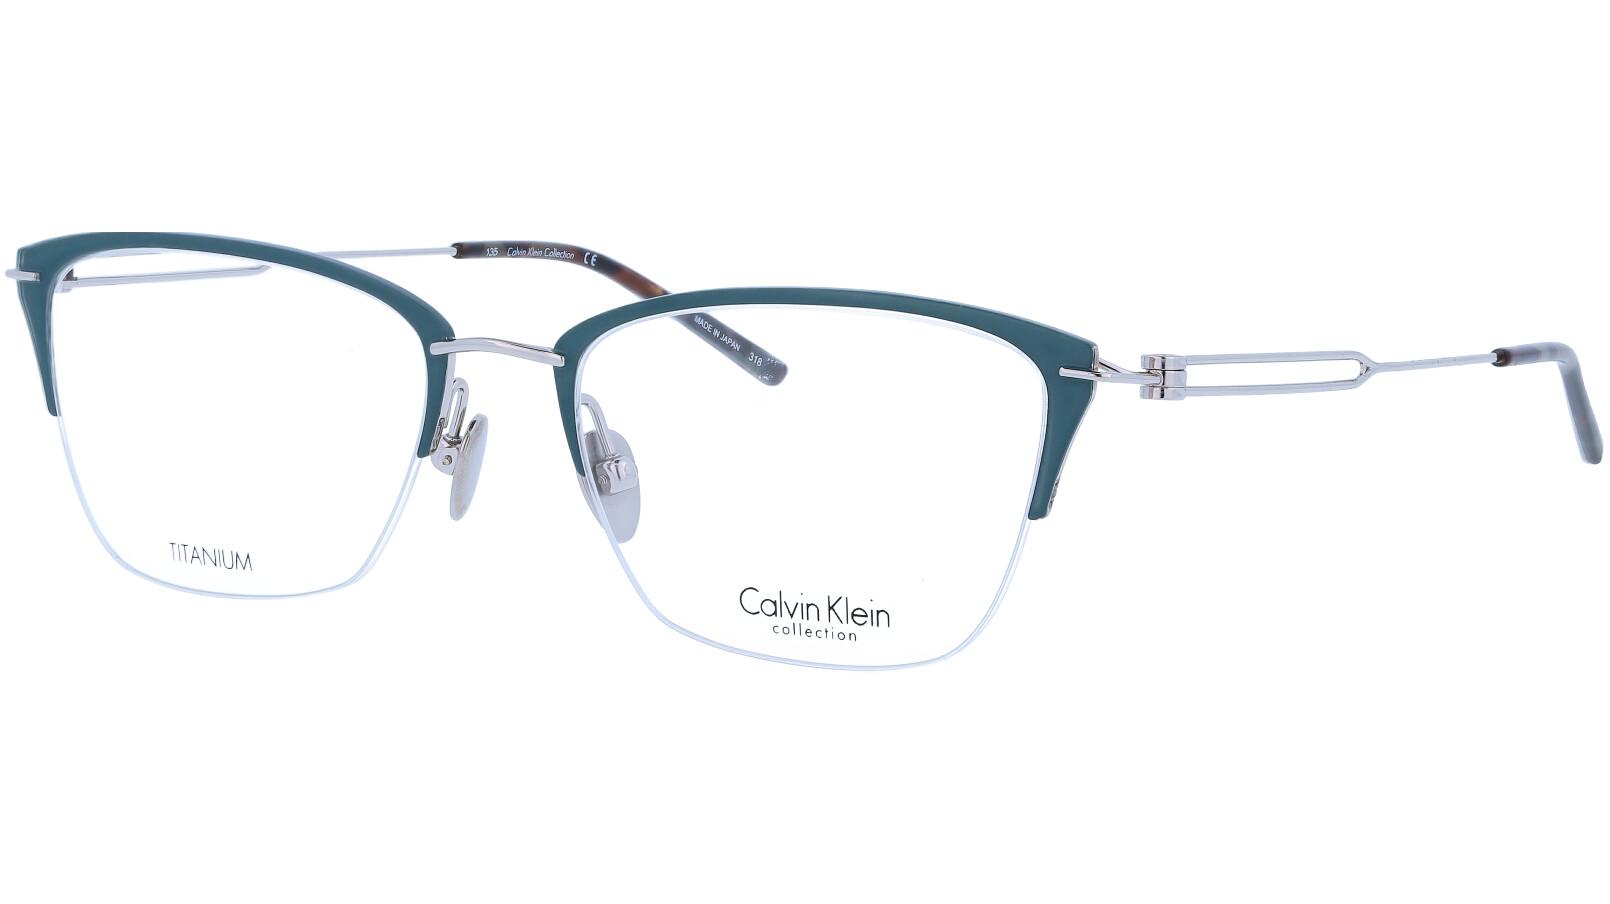 CALVIN KLEIN CK8065 406 52 BLUE Glasses